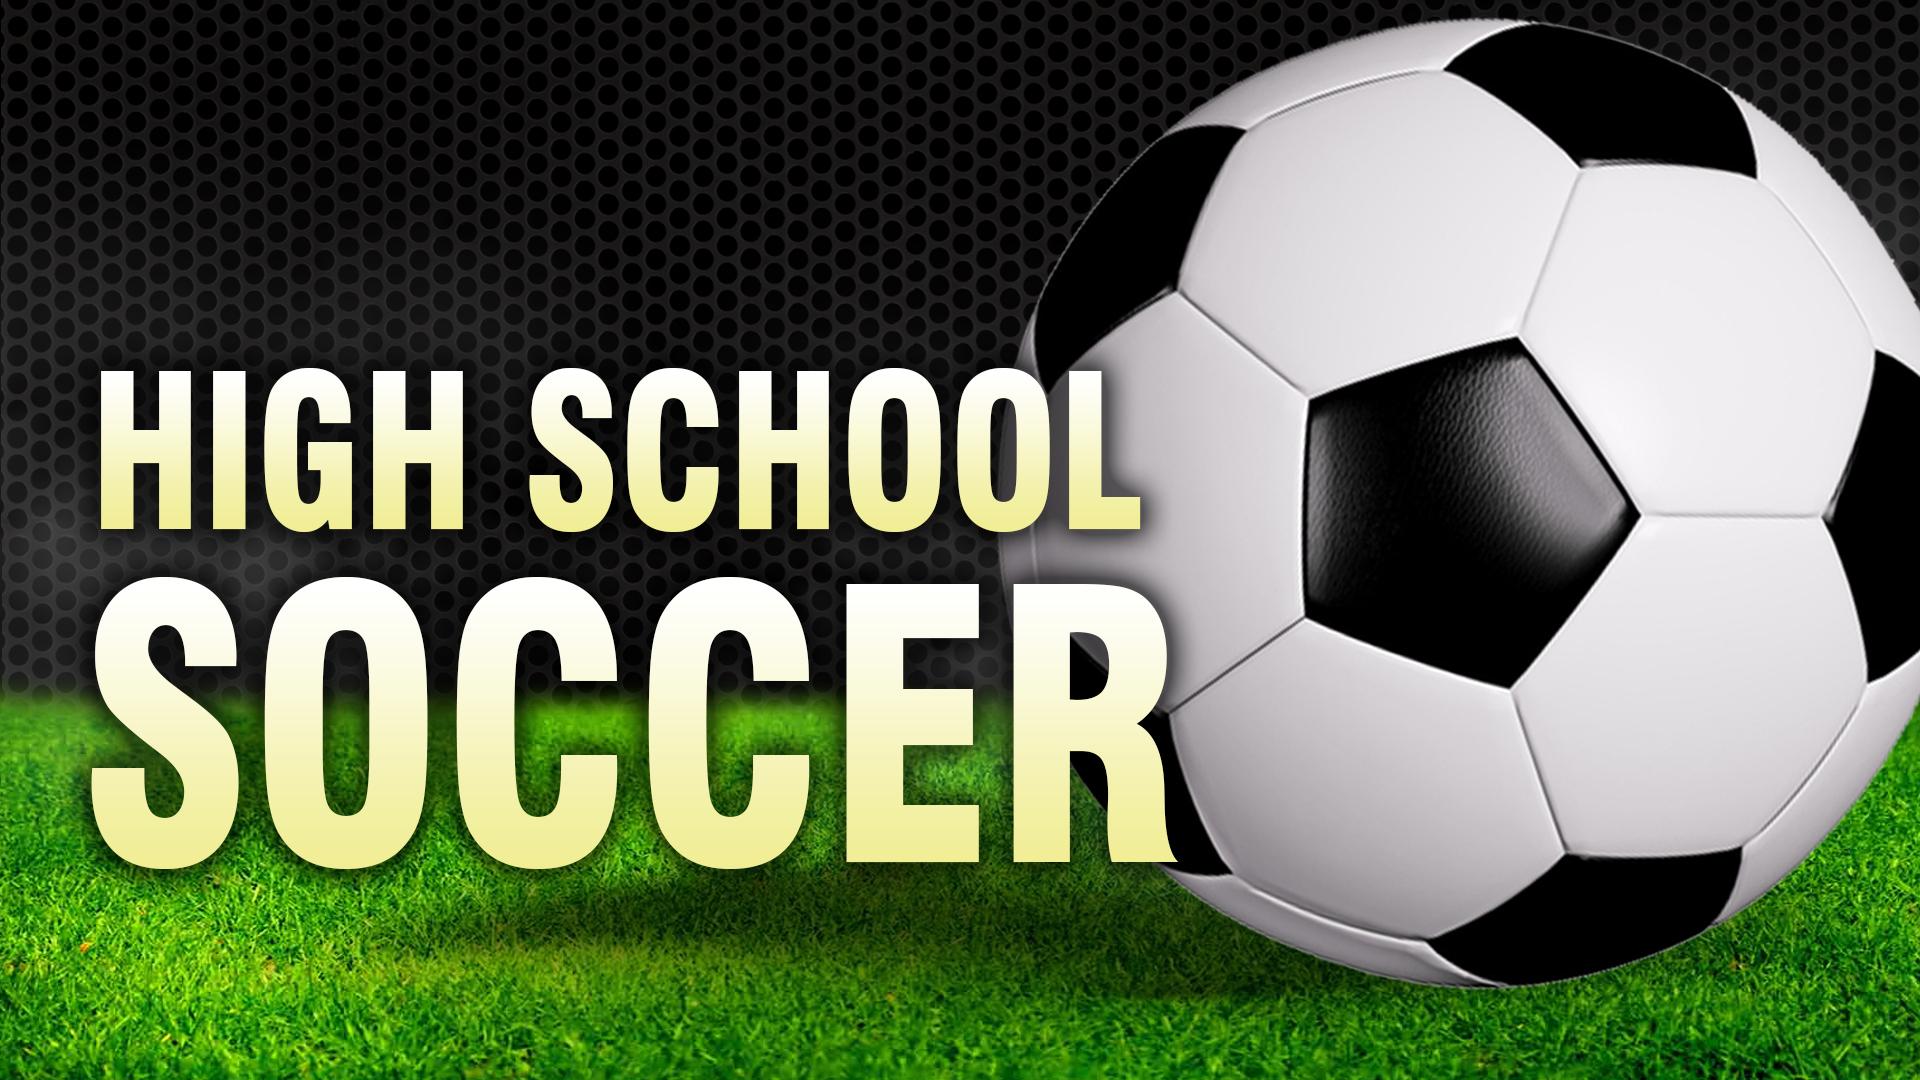 High School Soccer_1553732460143.jpg.jpg